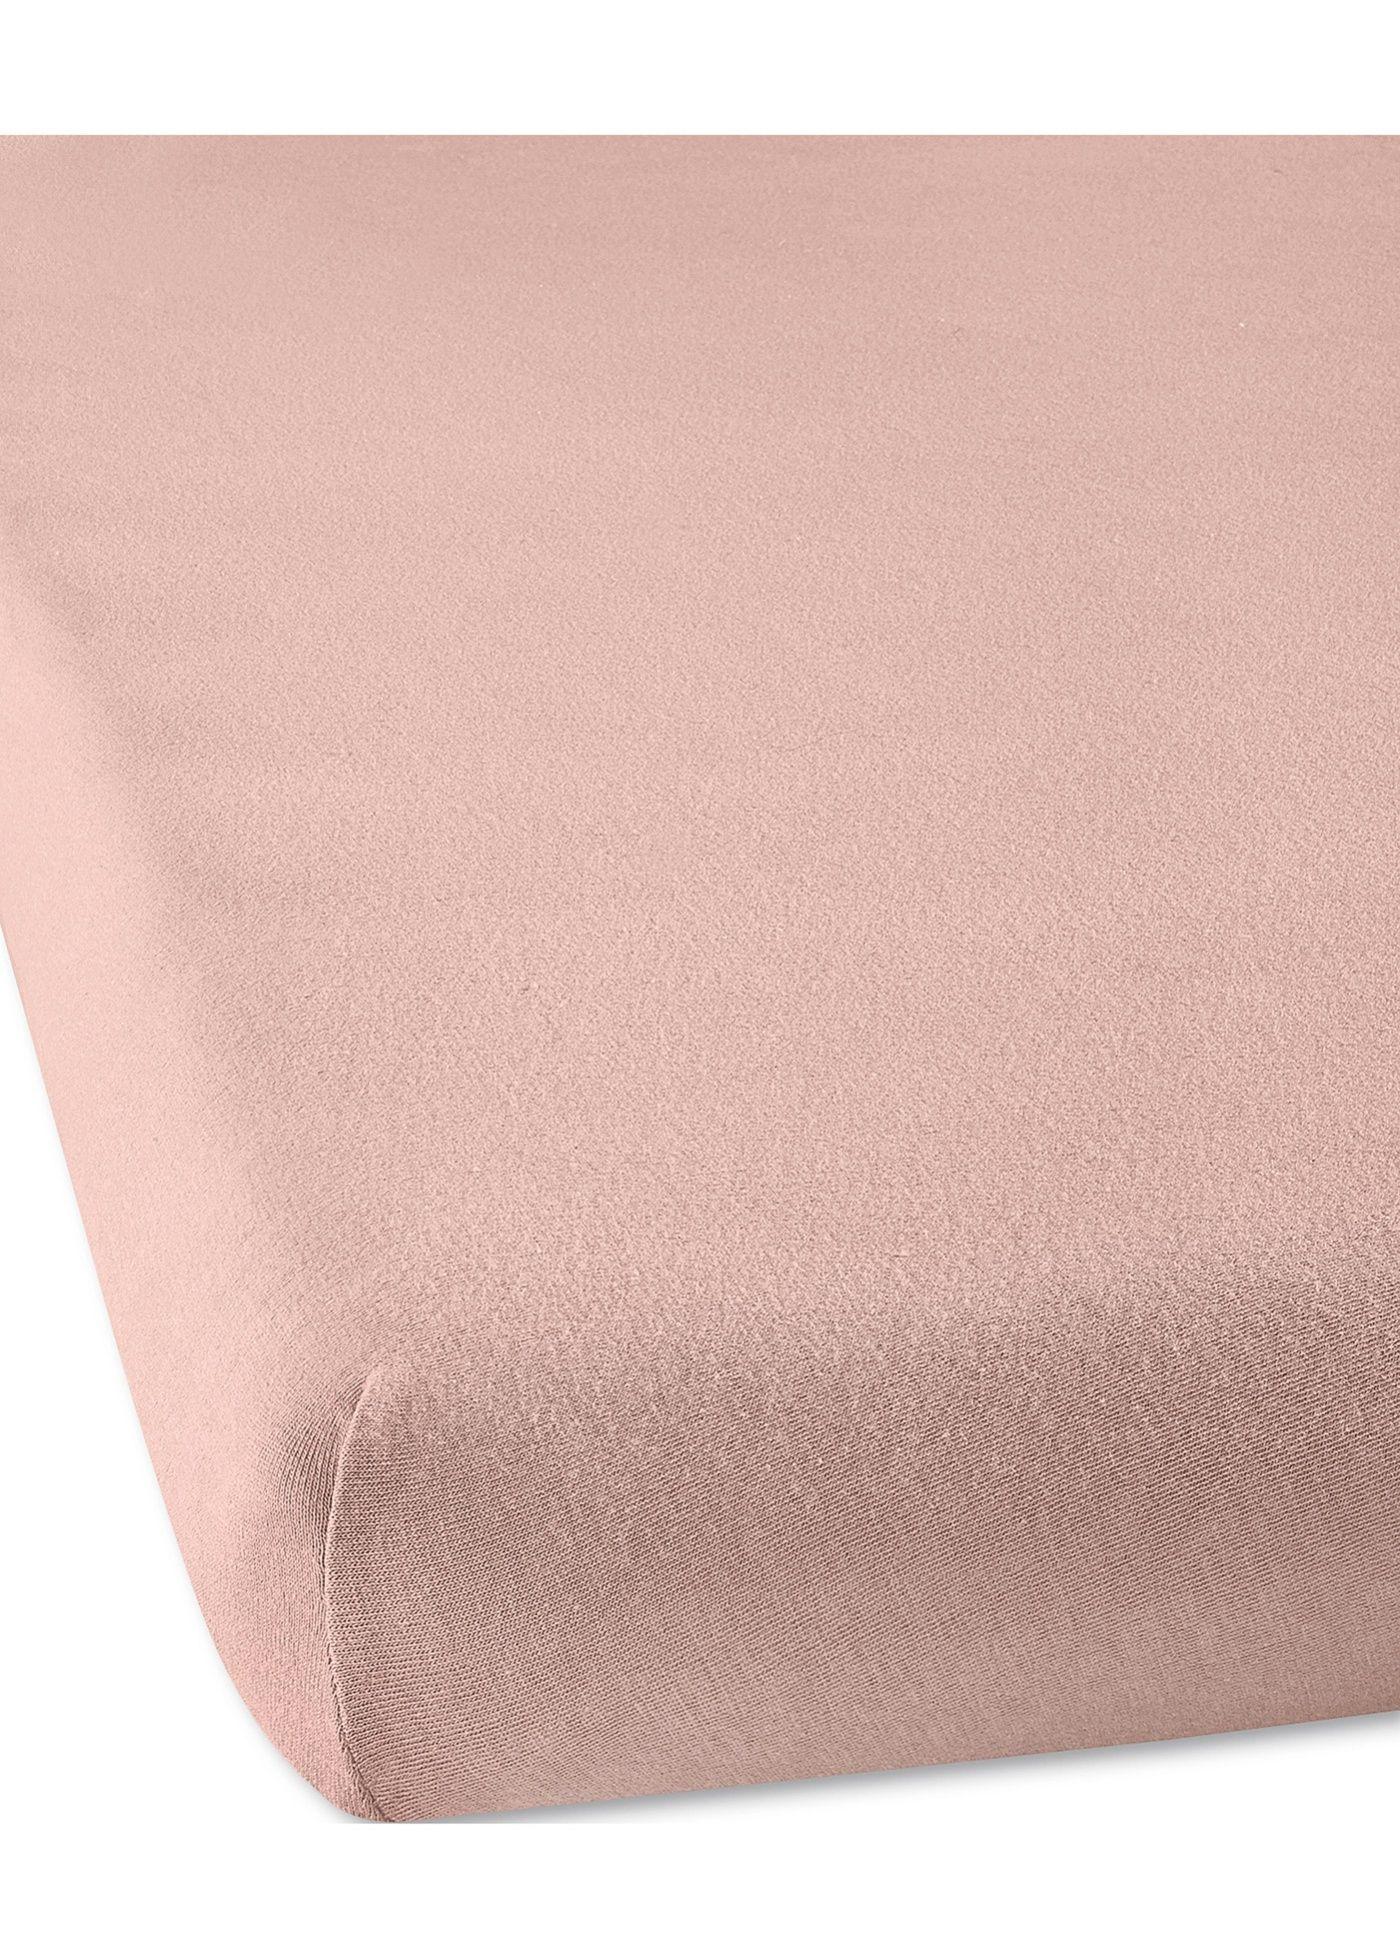 Spannbettlaken Elastic Jersey Topper Products In 2019